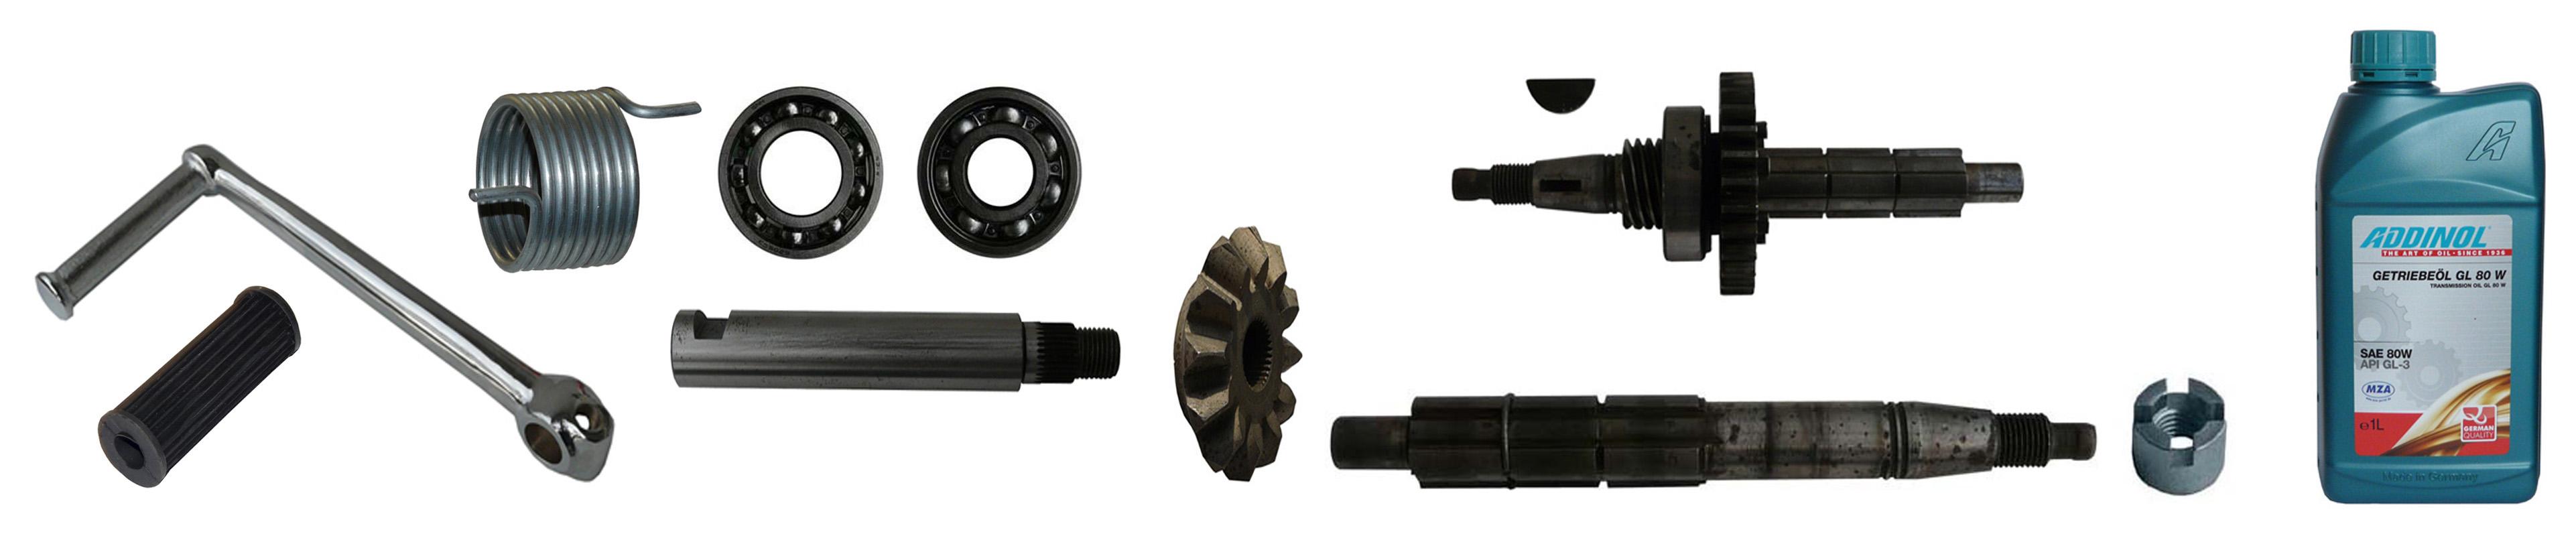 EMW R 35 Ersatzteile Getriebe Kickstarter